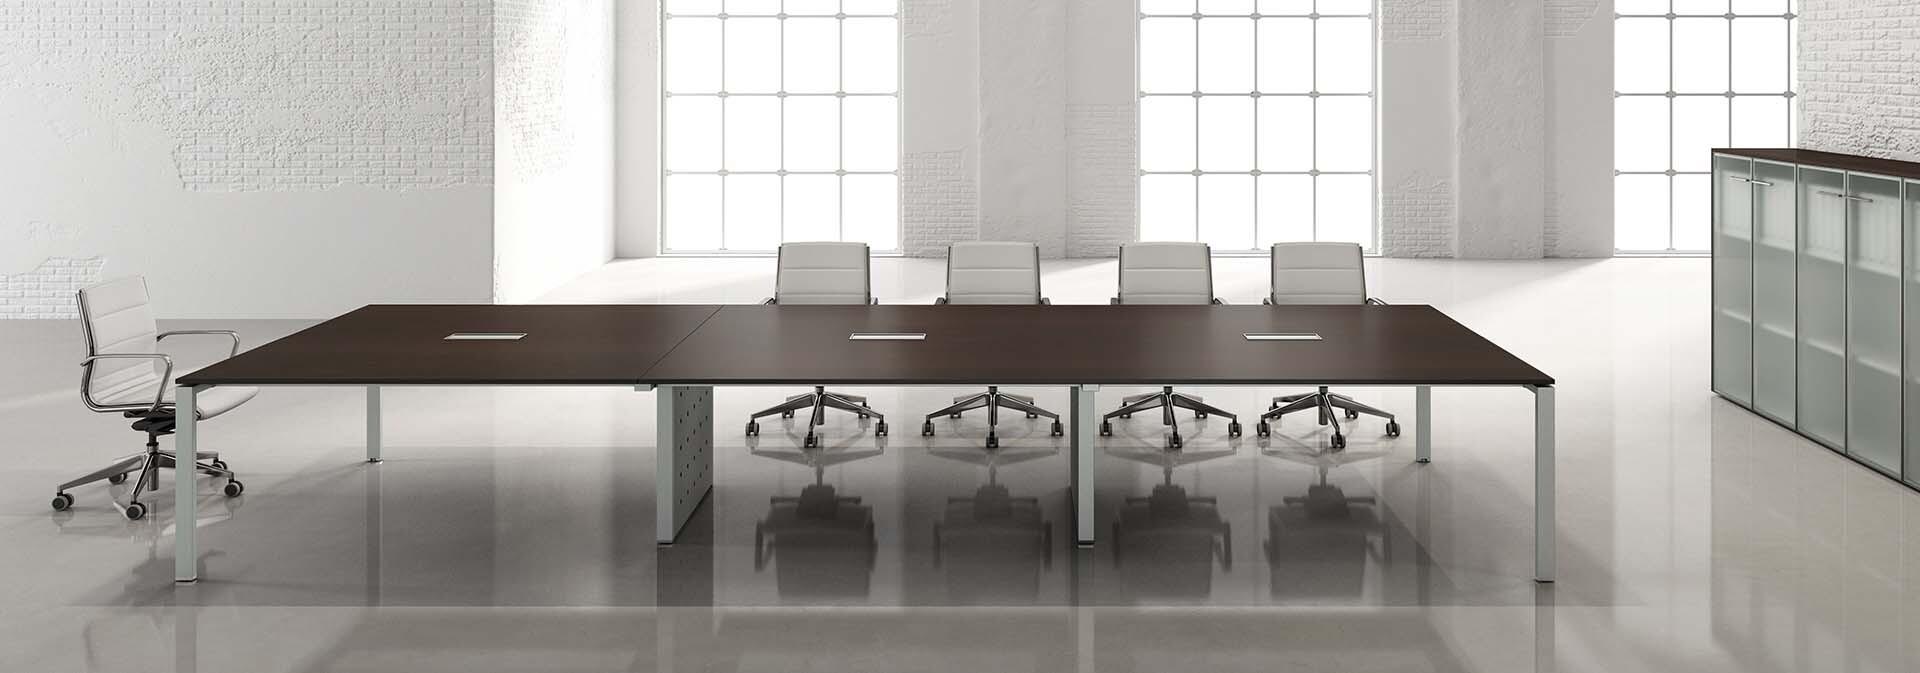 sedicinoni-meeting-table-02.jpg